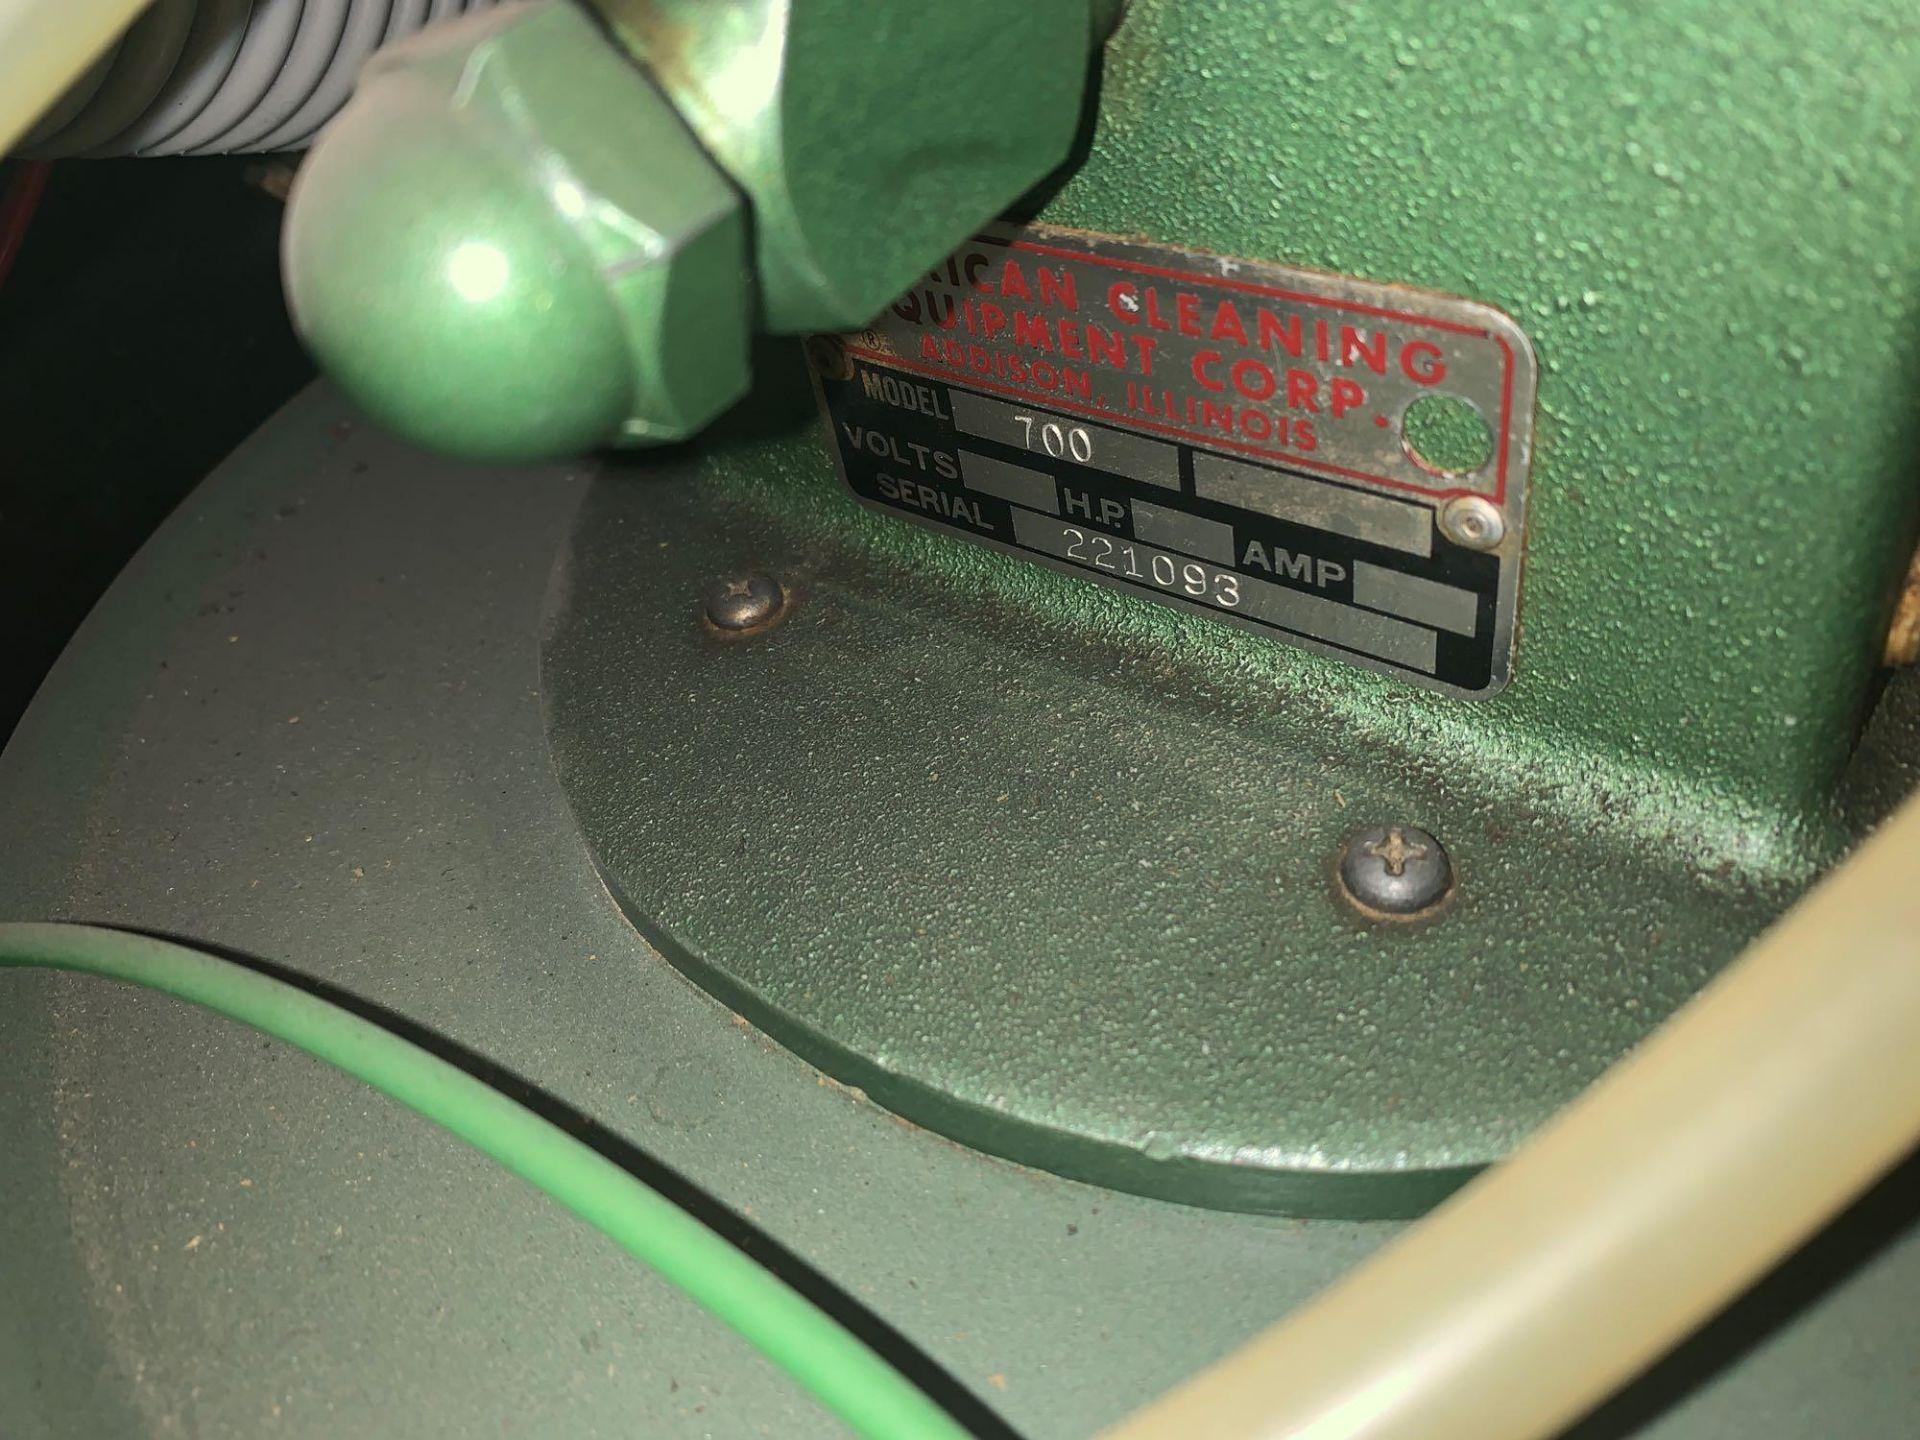 Fairchild Clean Master Bottle Sanitizer - Image 7 of 7